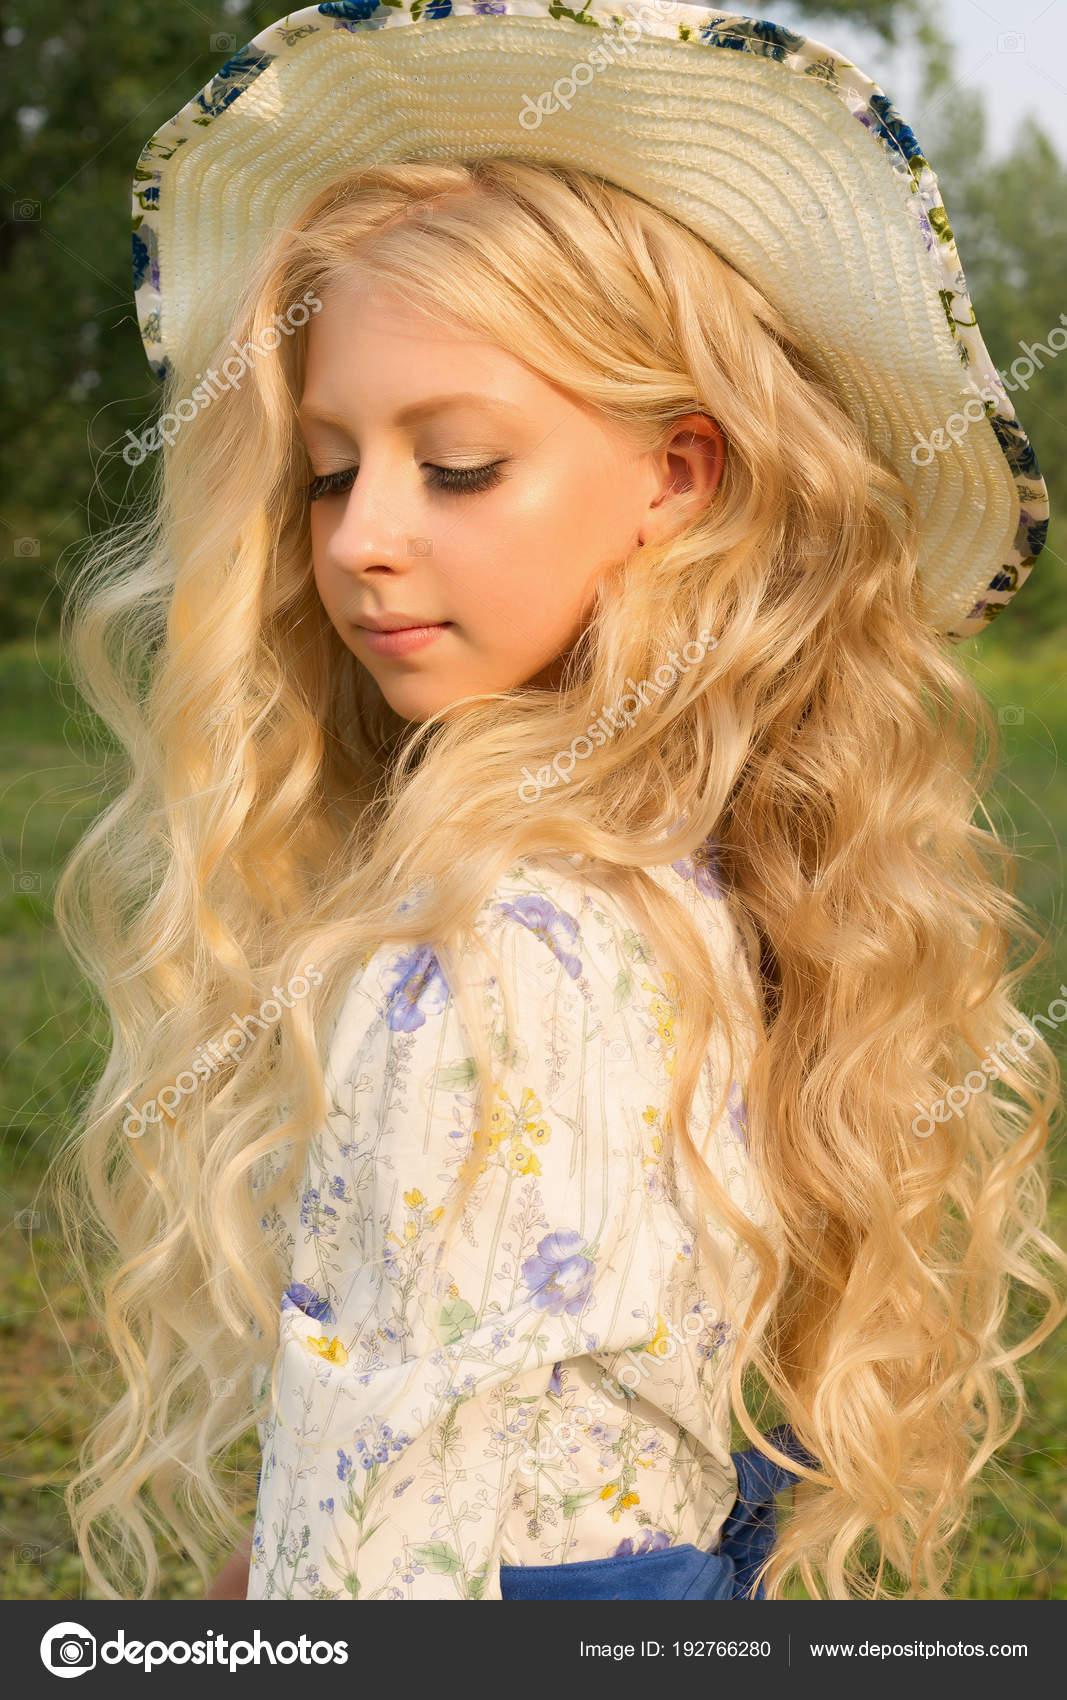 Wunderschöne Charmante Langen Lockigen Blonden Haaren